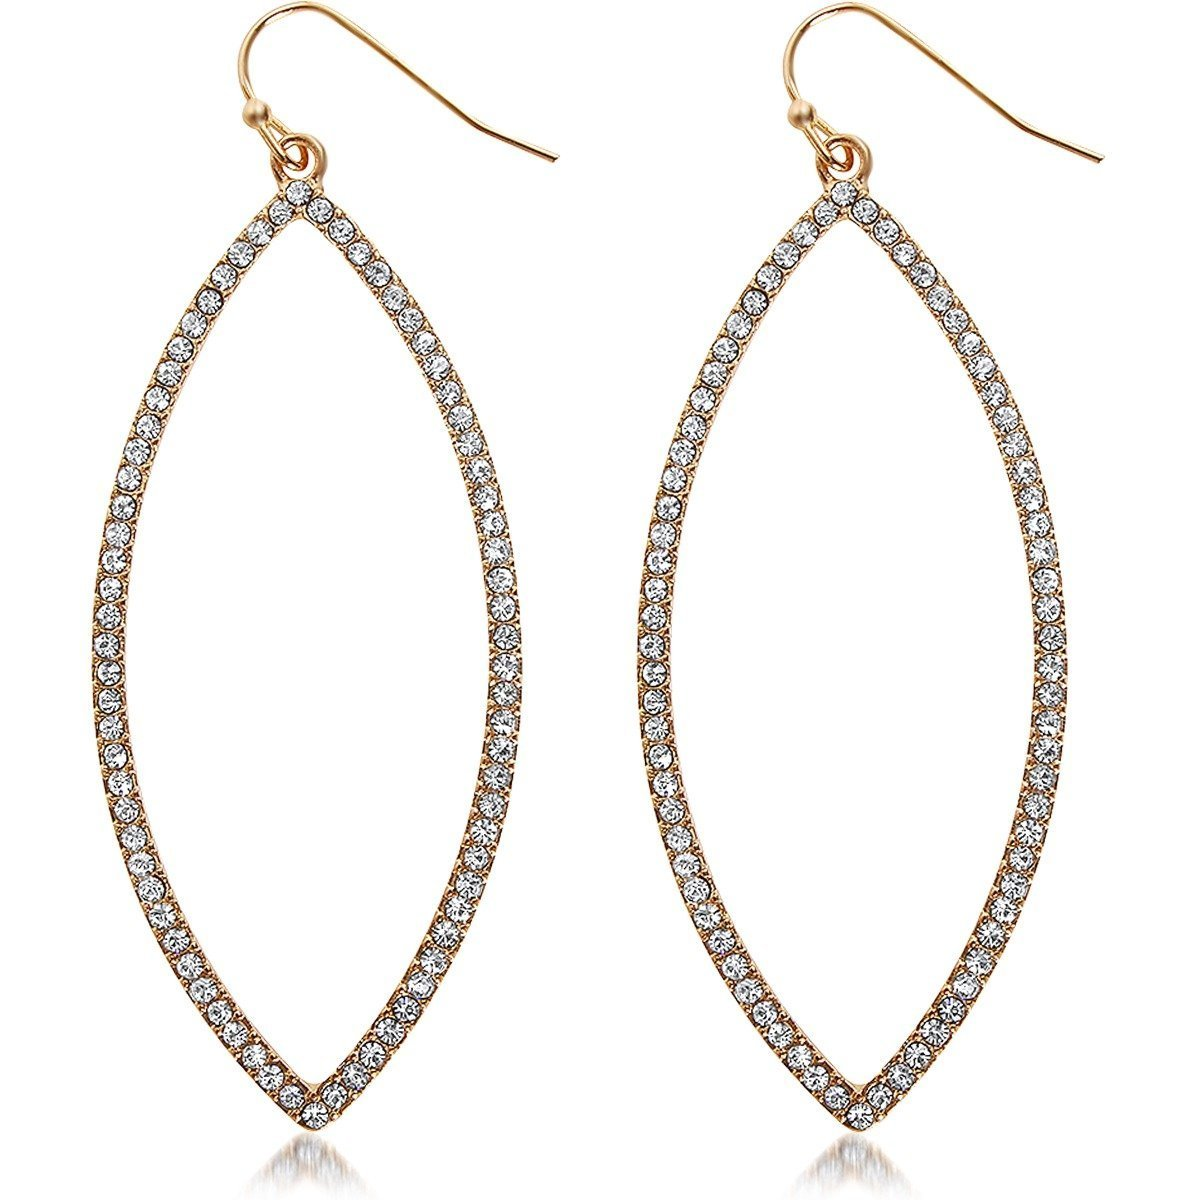 Humble Chic Hoop Dangle Earrings - Simulated Diamond Marquise Teardrop Statement Rhinestone Drops, Gold-Tone